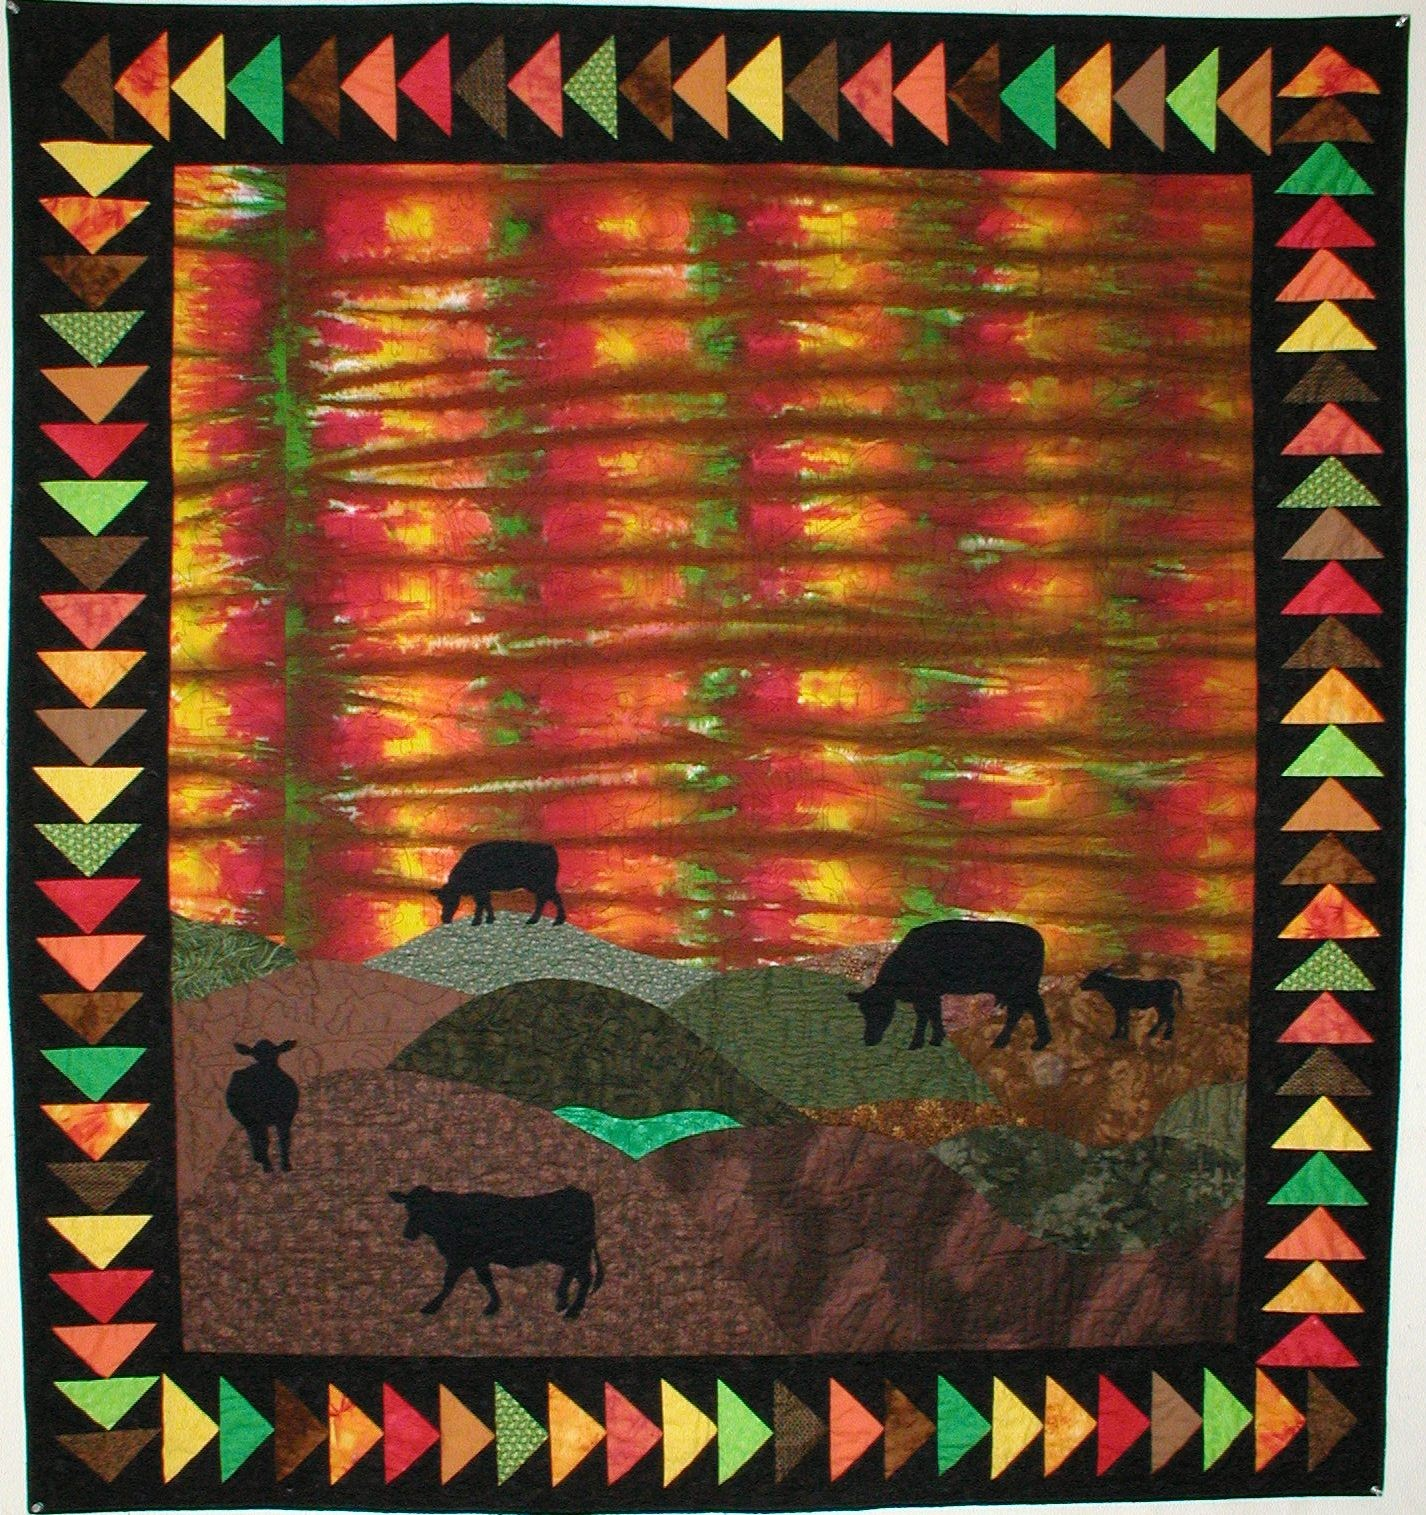 Barnyard Dreams - Quilt